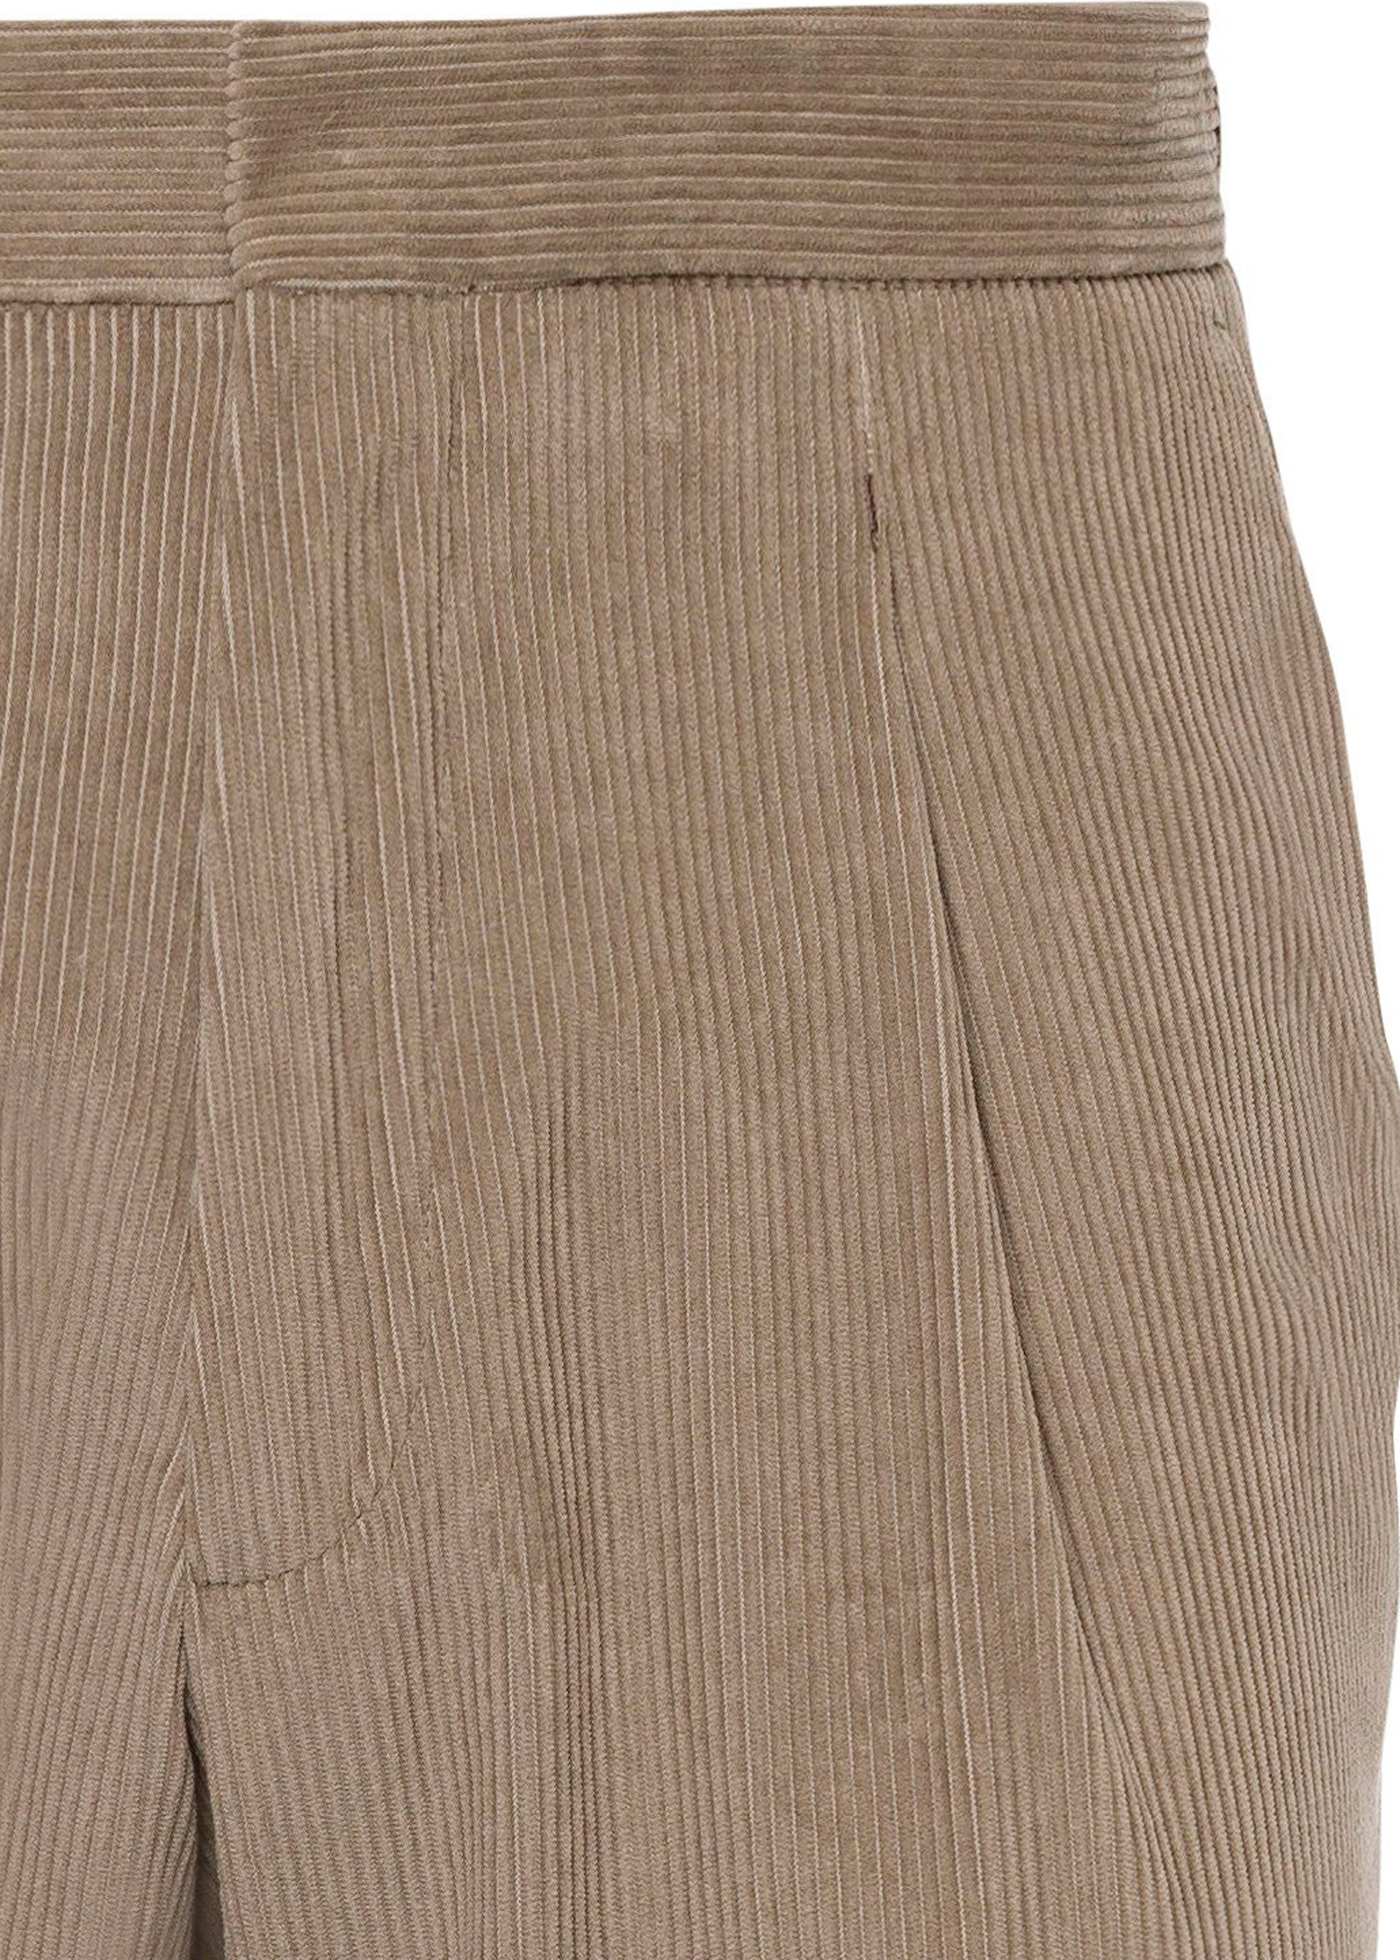 COTTON CORDUROY PANTS image number 2